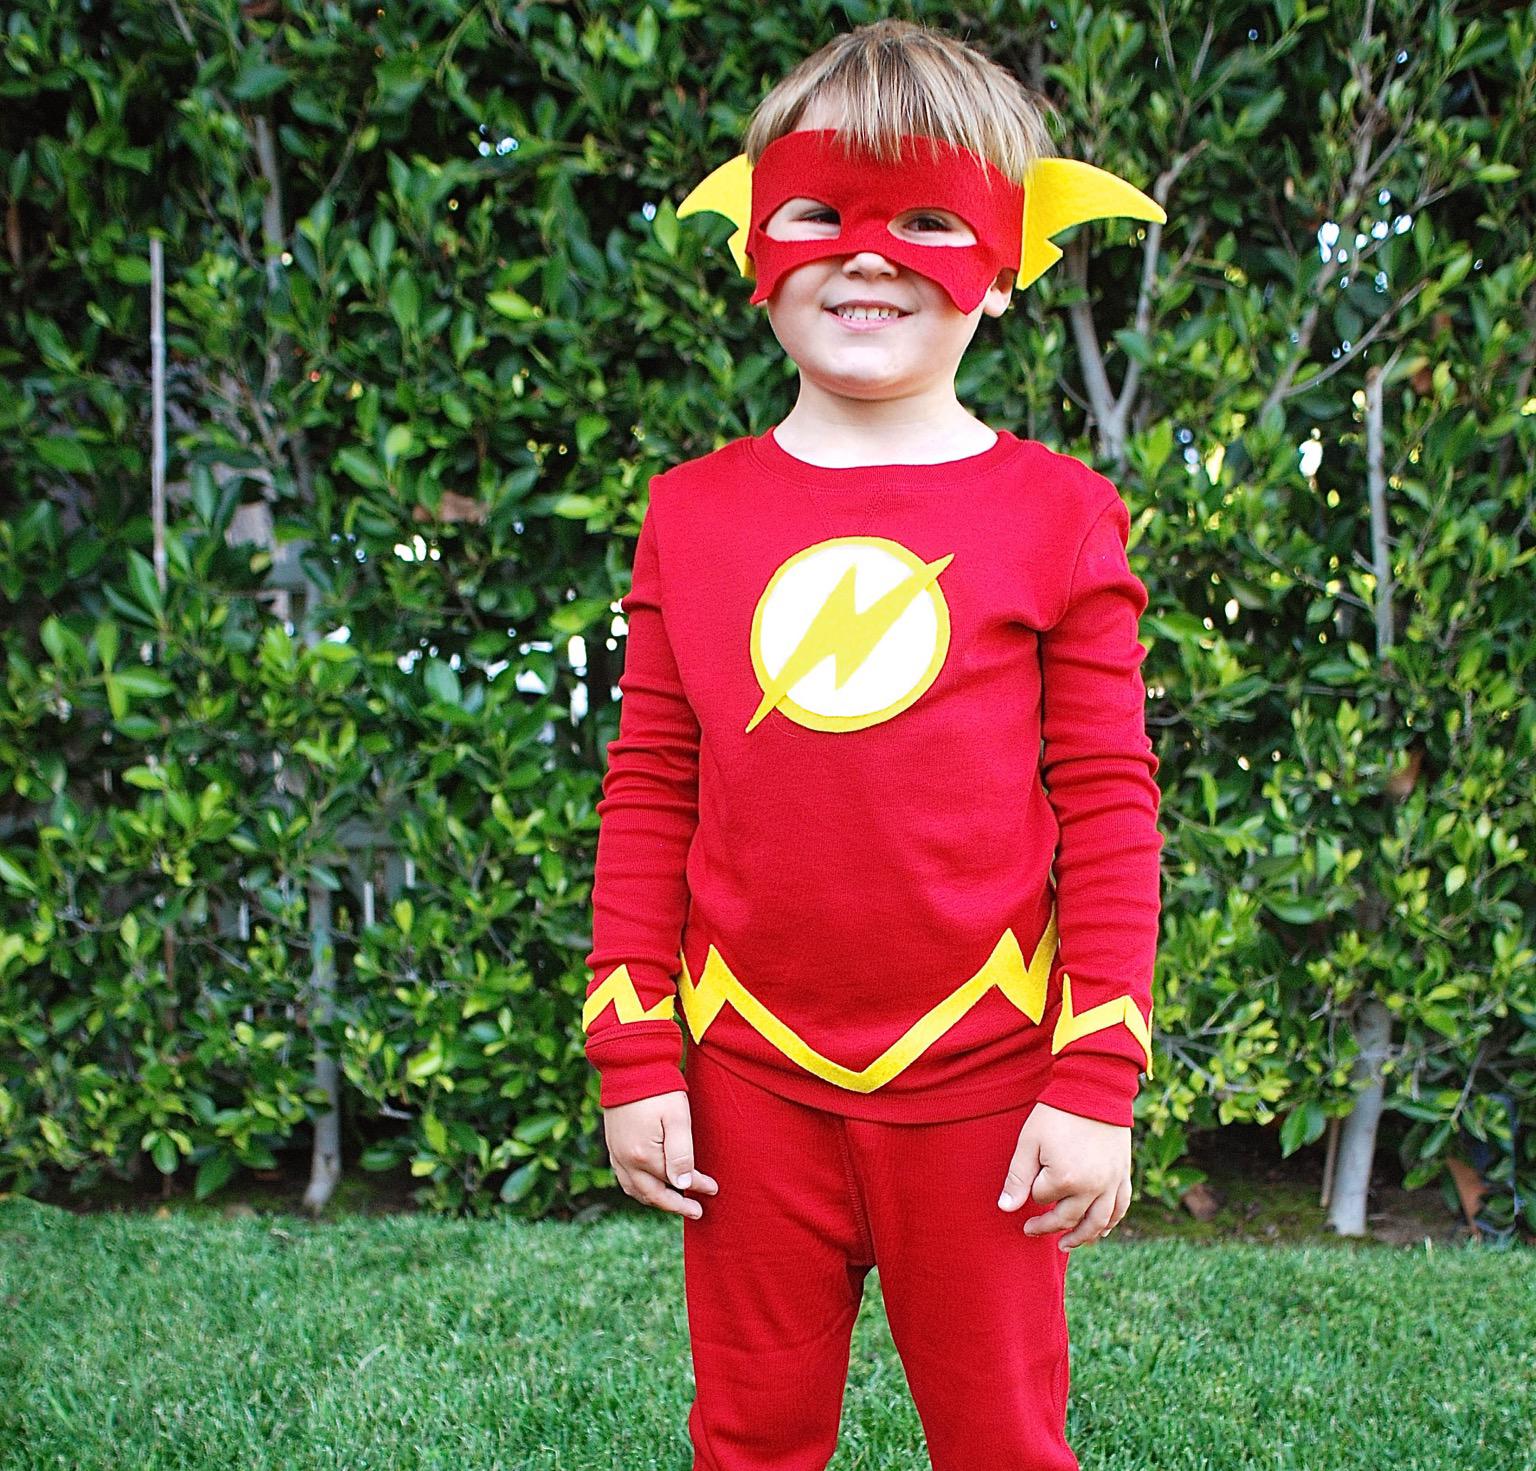 No-Sew DIY the flash super heroes Costume   Primary.com  sc 1 st  Primary & No-Sew DIY The flash Kids Costume   Primary.com